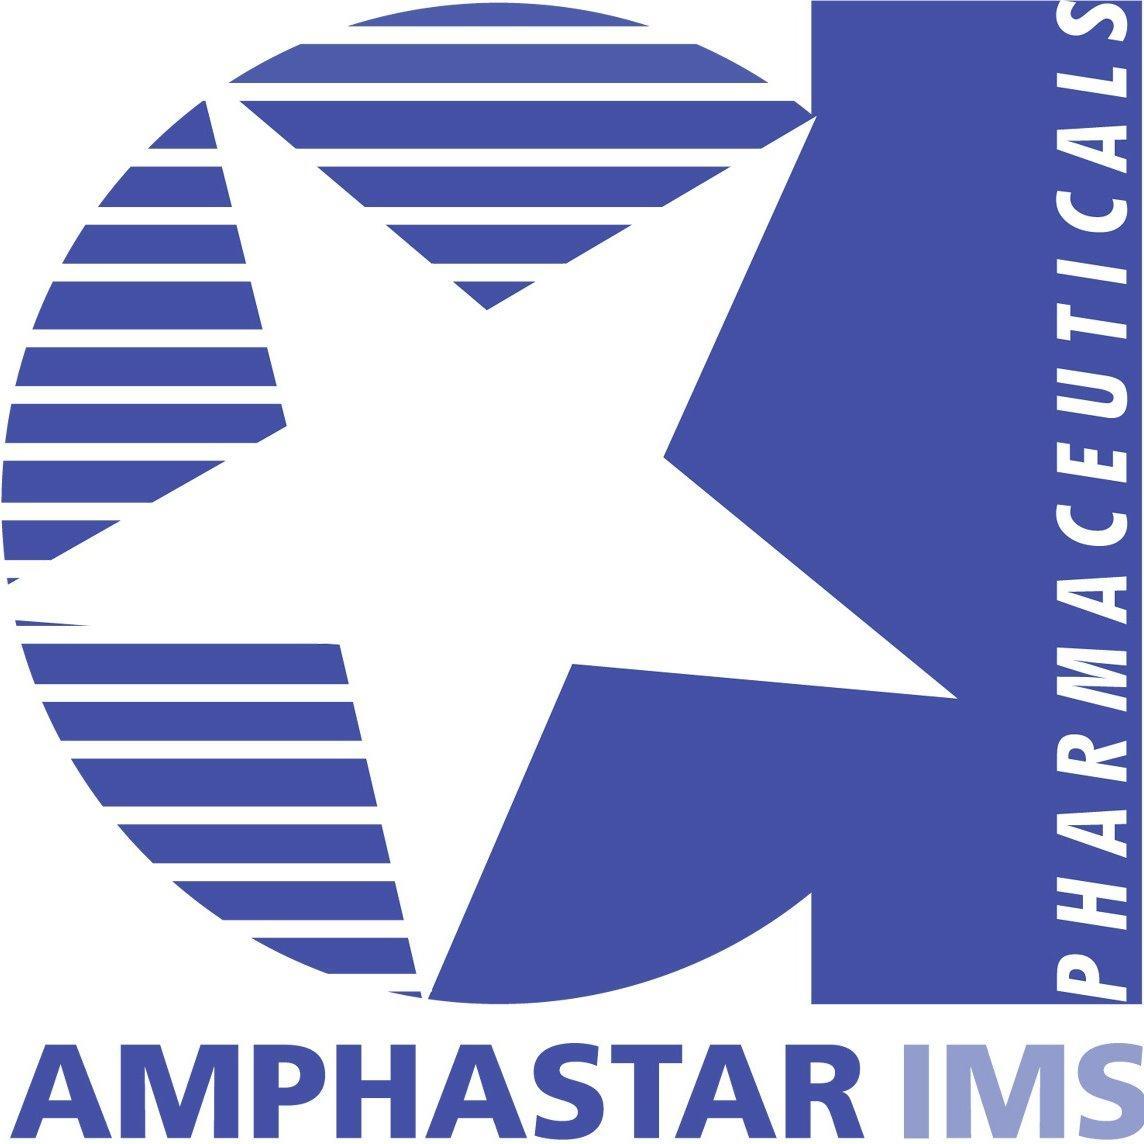 Amphastar Pharmaceuticals Inc. - Rancho Cucamonga, CA - Pharmacist